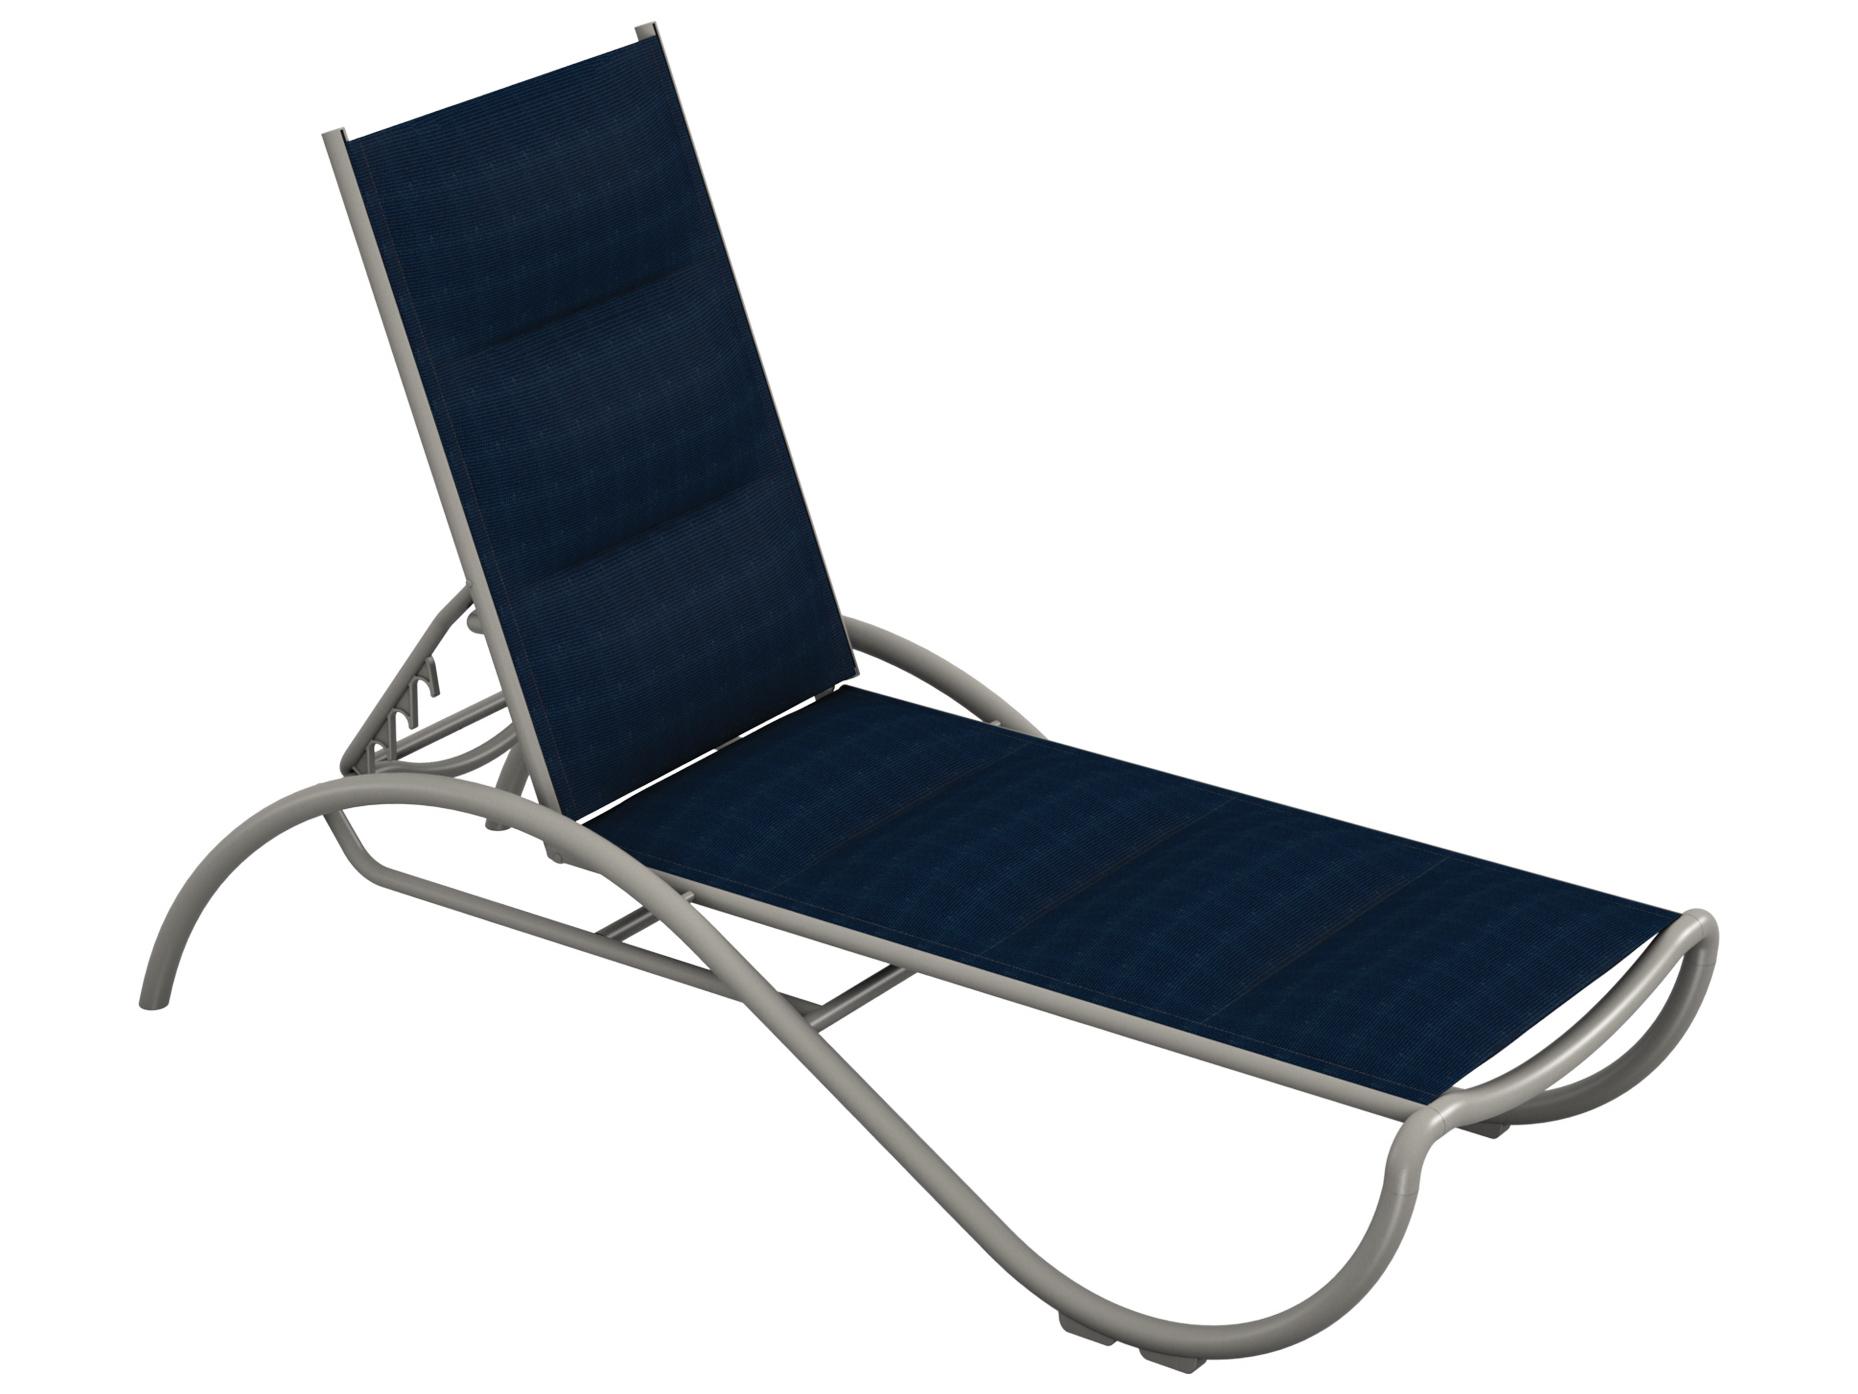 Tropitone la scala padded sling aluminum chaise lounge for Aluminum strap chaise lounge